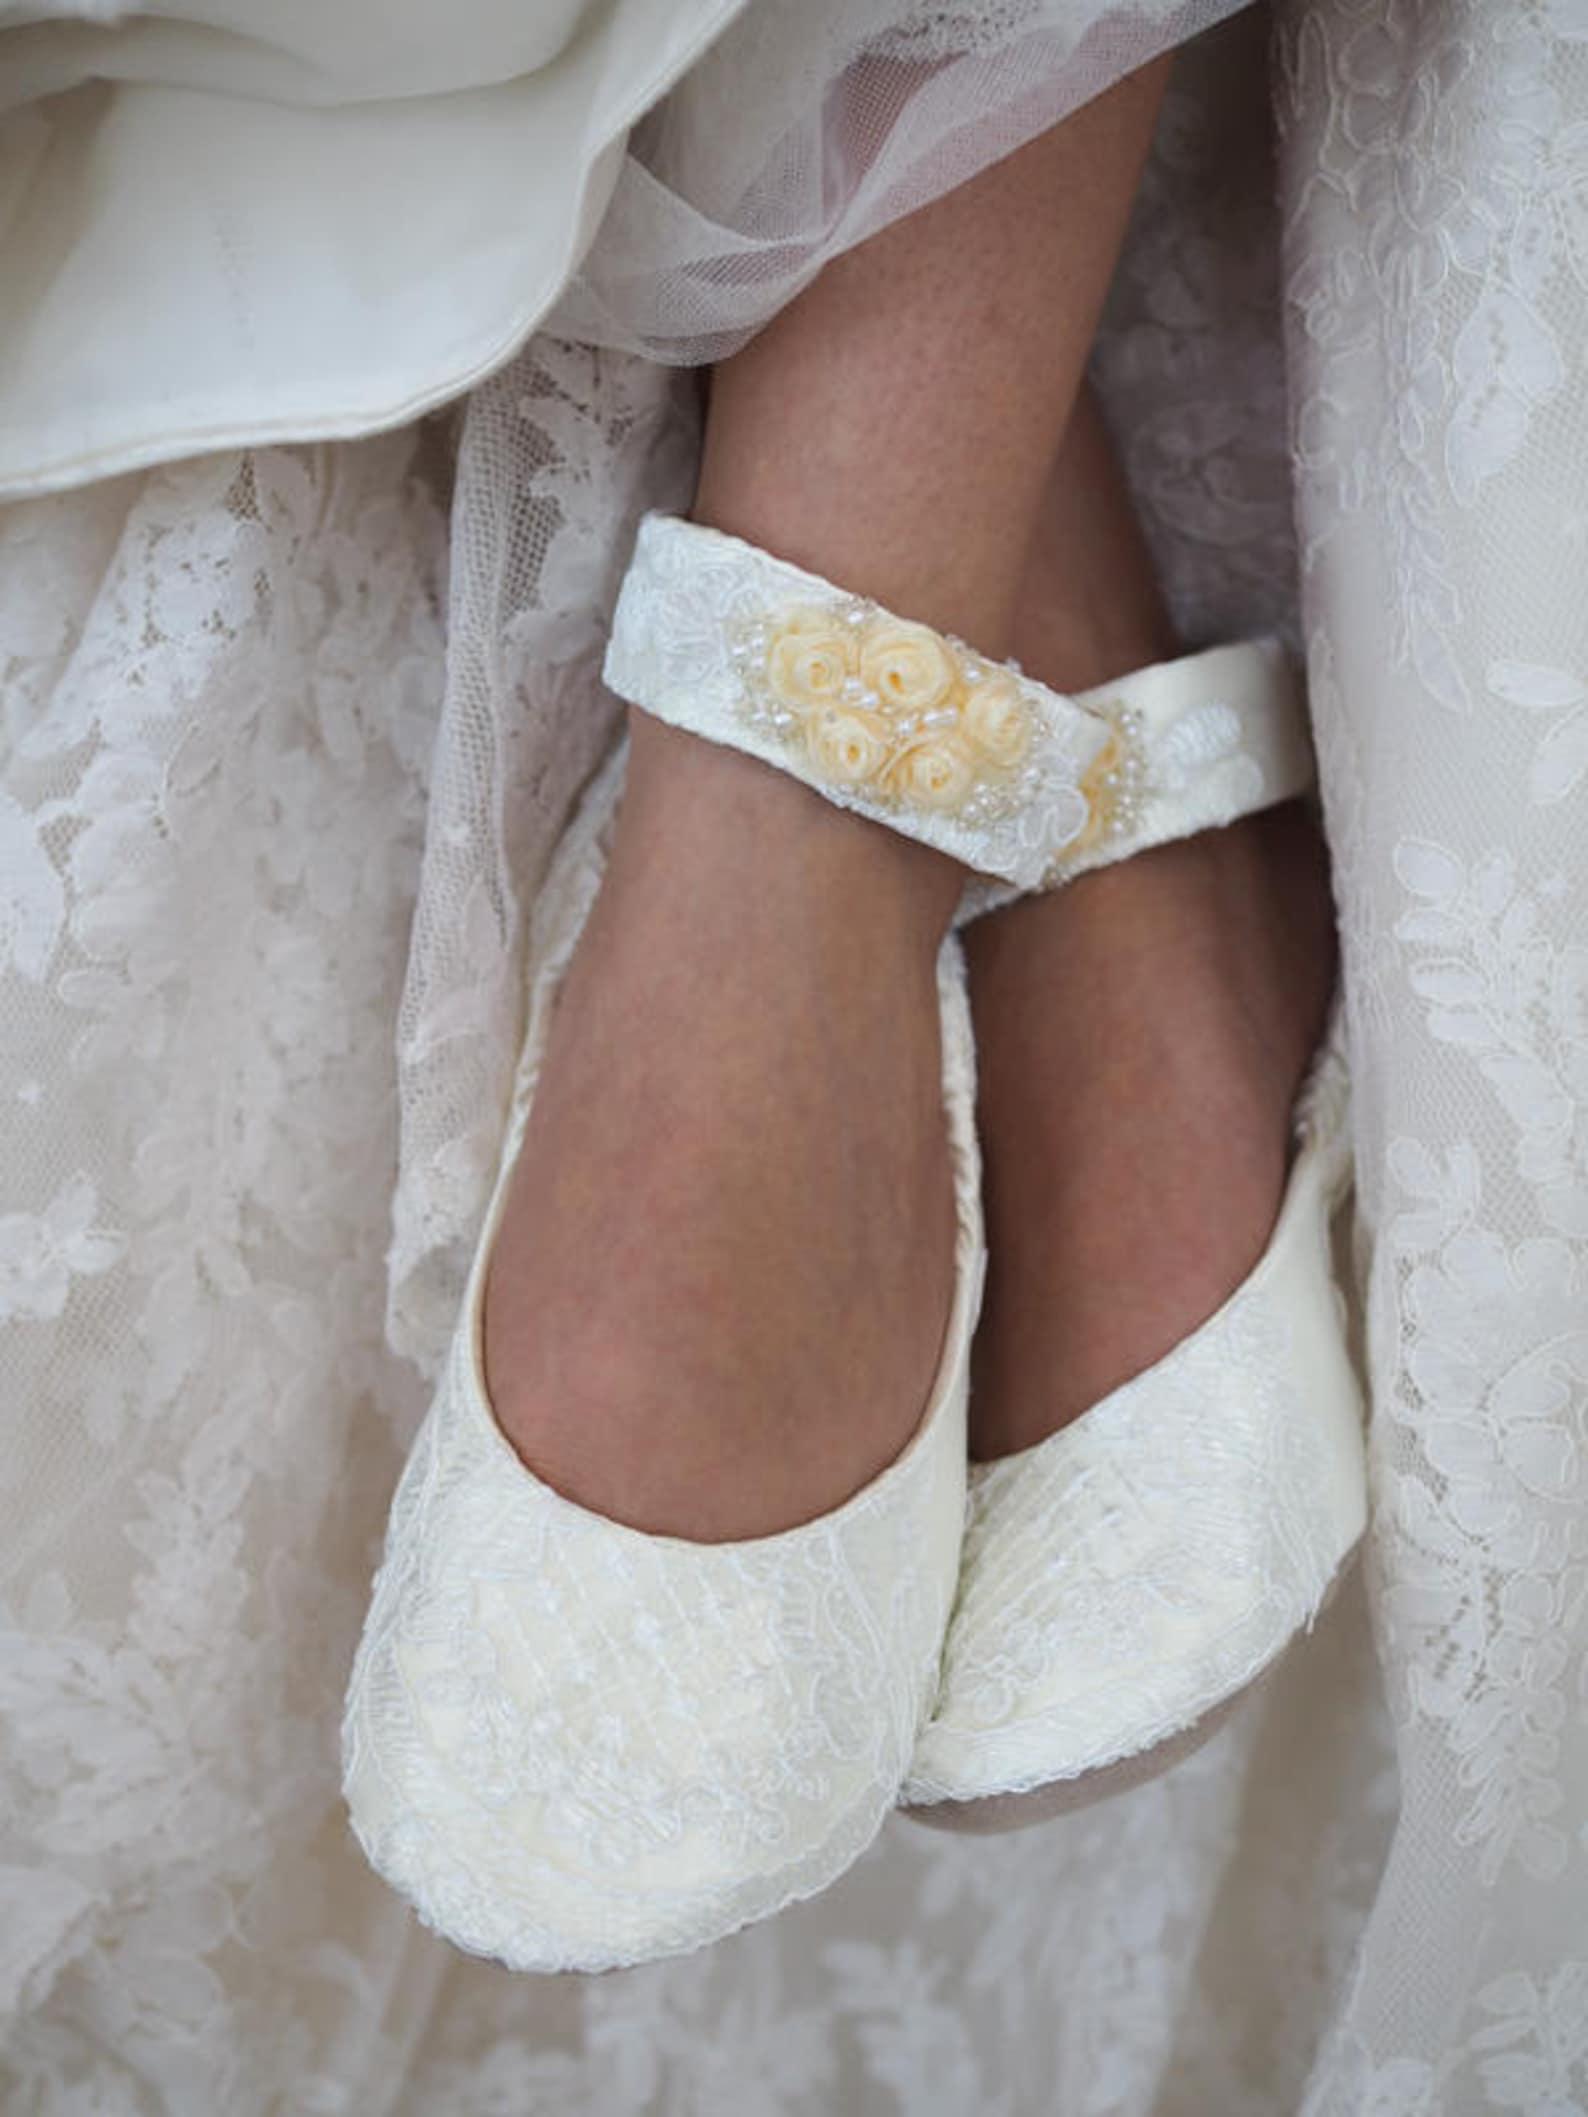 ivory lace bridal ballet shoe with ivory rosettes~ custom wedding ballet flat with embellished ankle straps~ lace ballet bridal